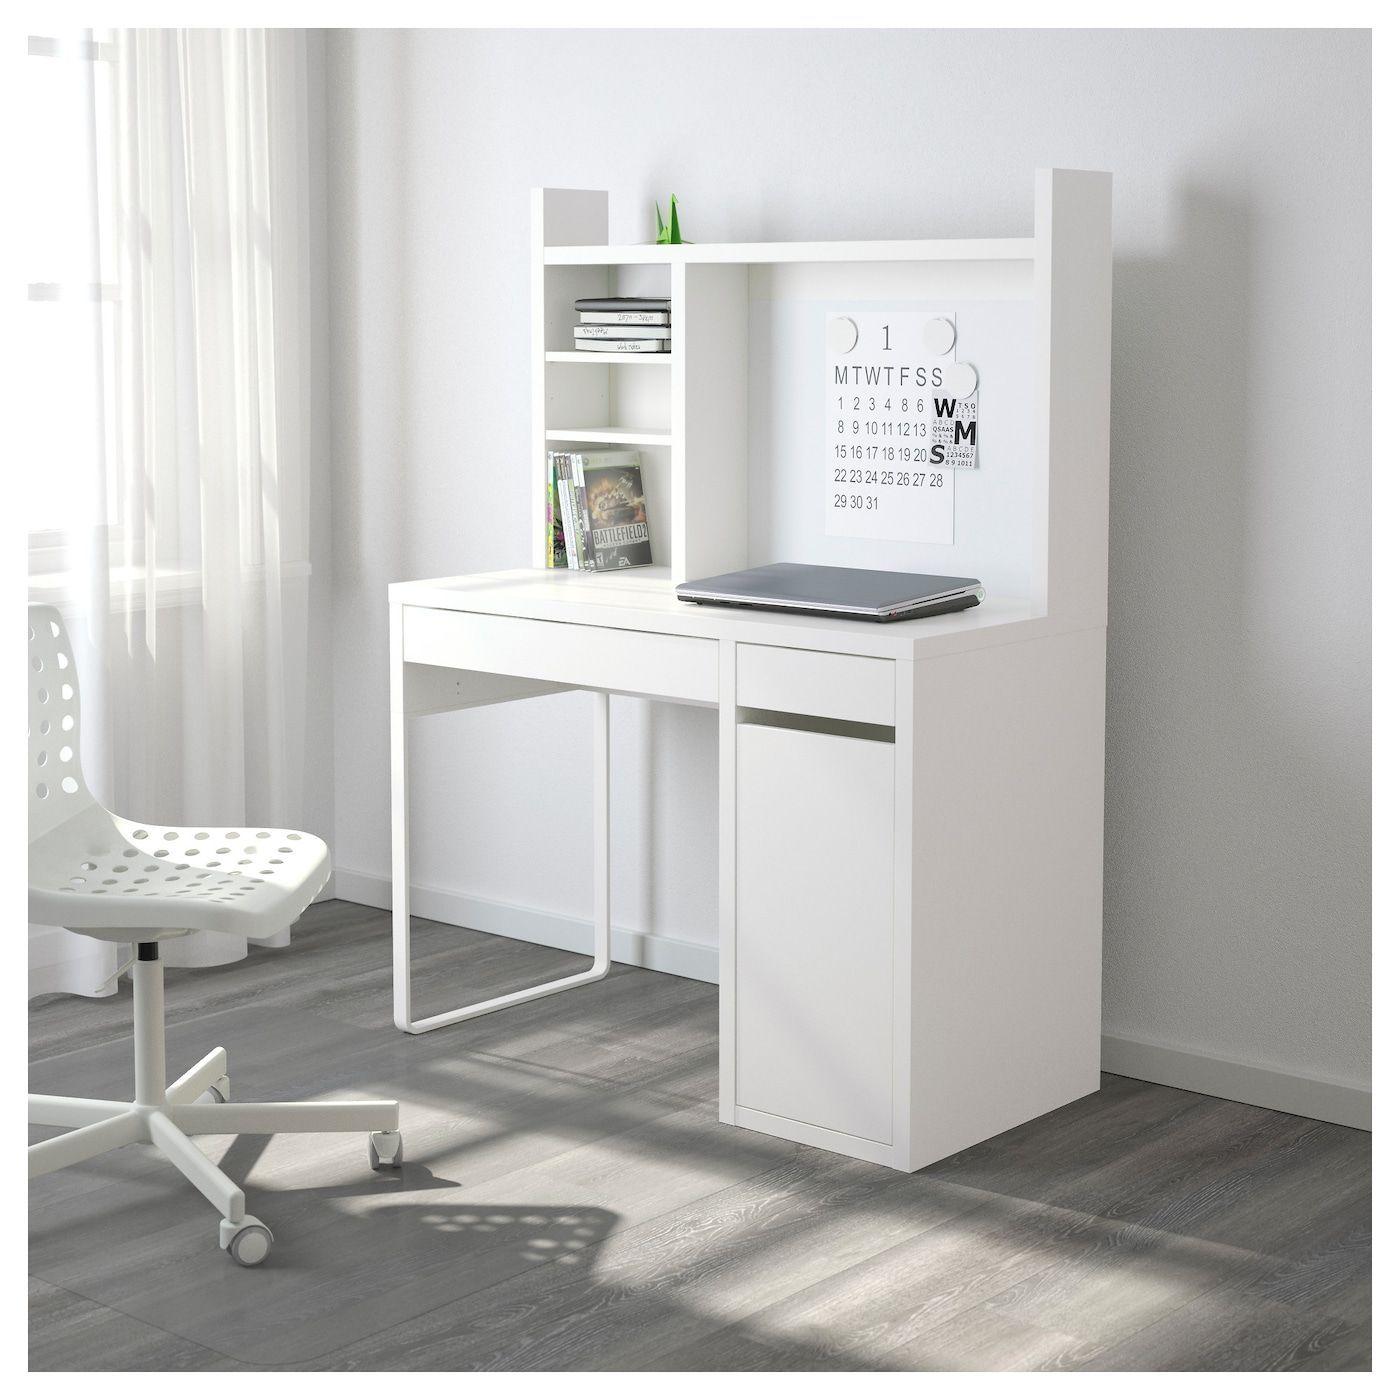 Pc Gaming Setup Discover MICKE Desk white 41 3/8x19 5/8